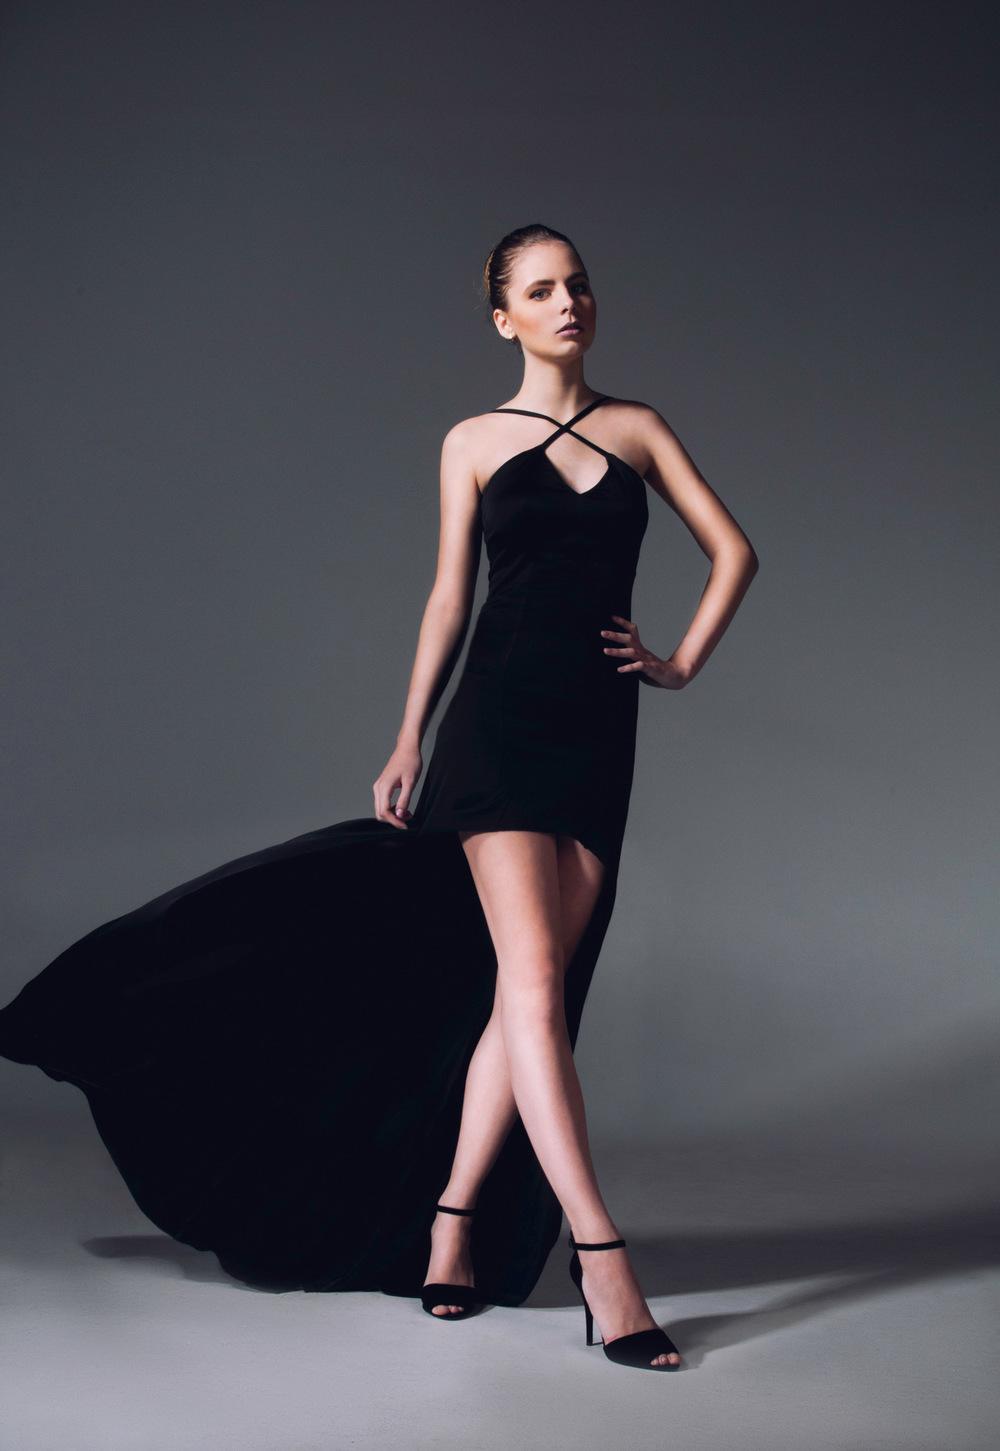 Javi Salinas Fotografo de moda y publicidad, Madrid , Barcelona - Fashion beauty & advertising photographer www.javisalinas.com -